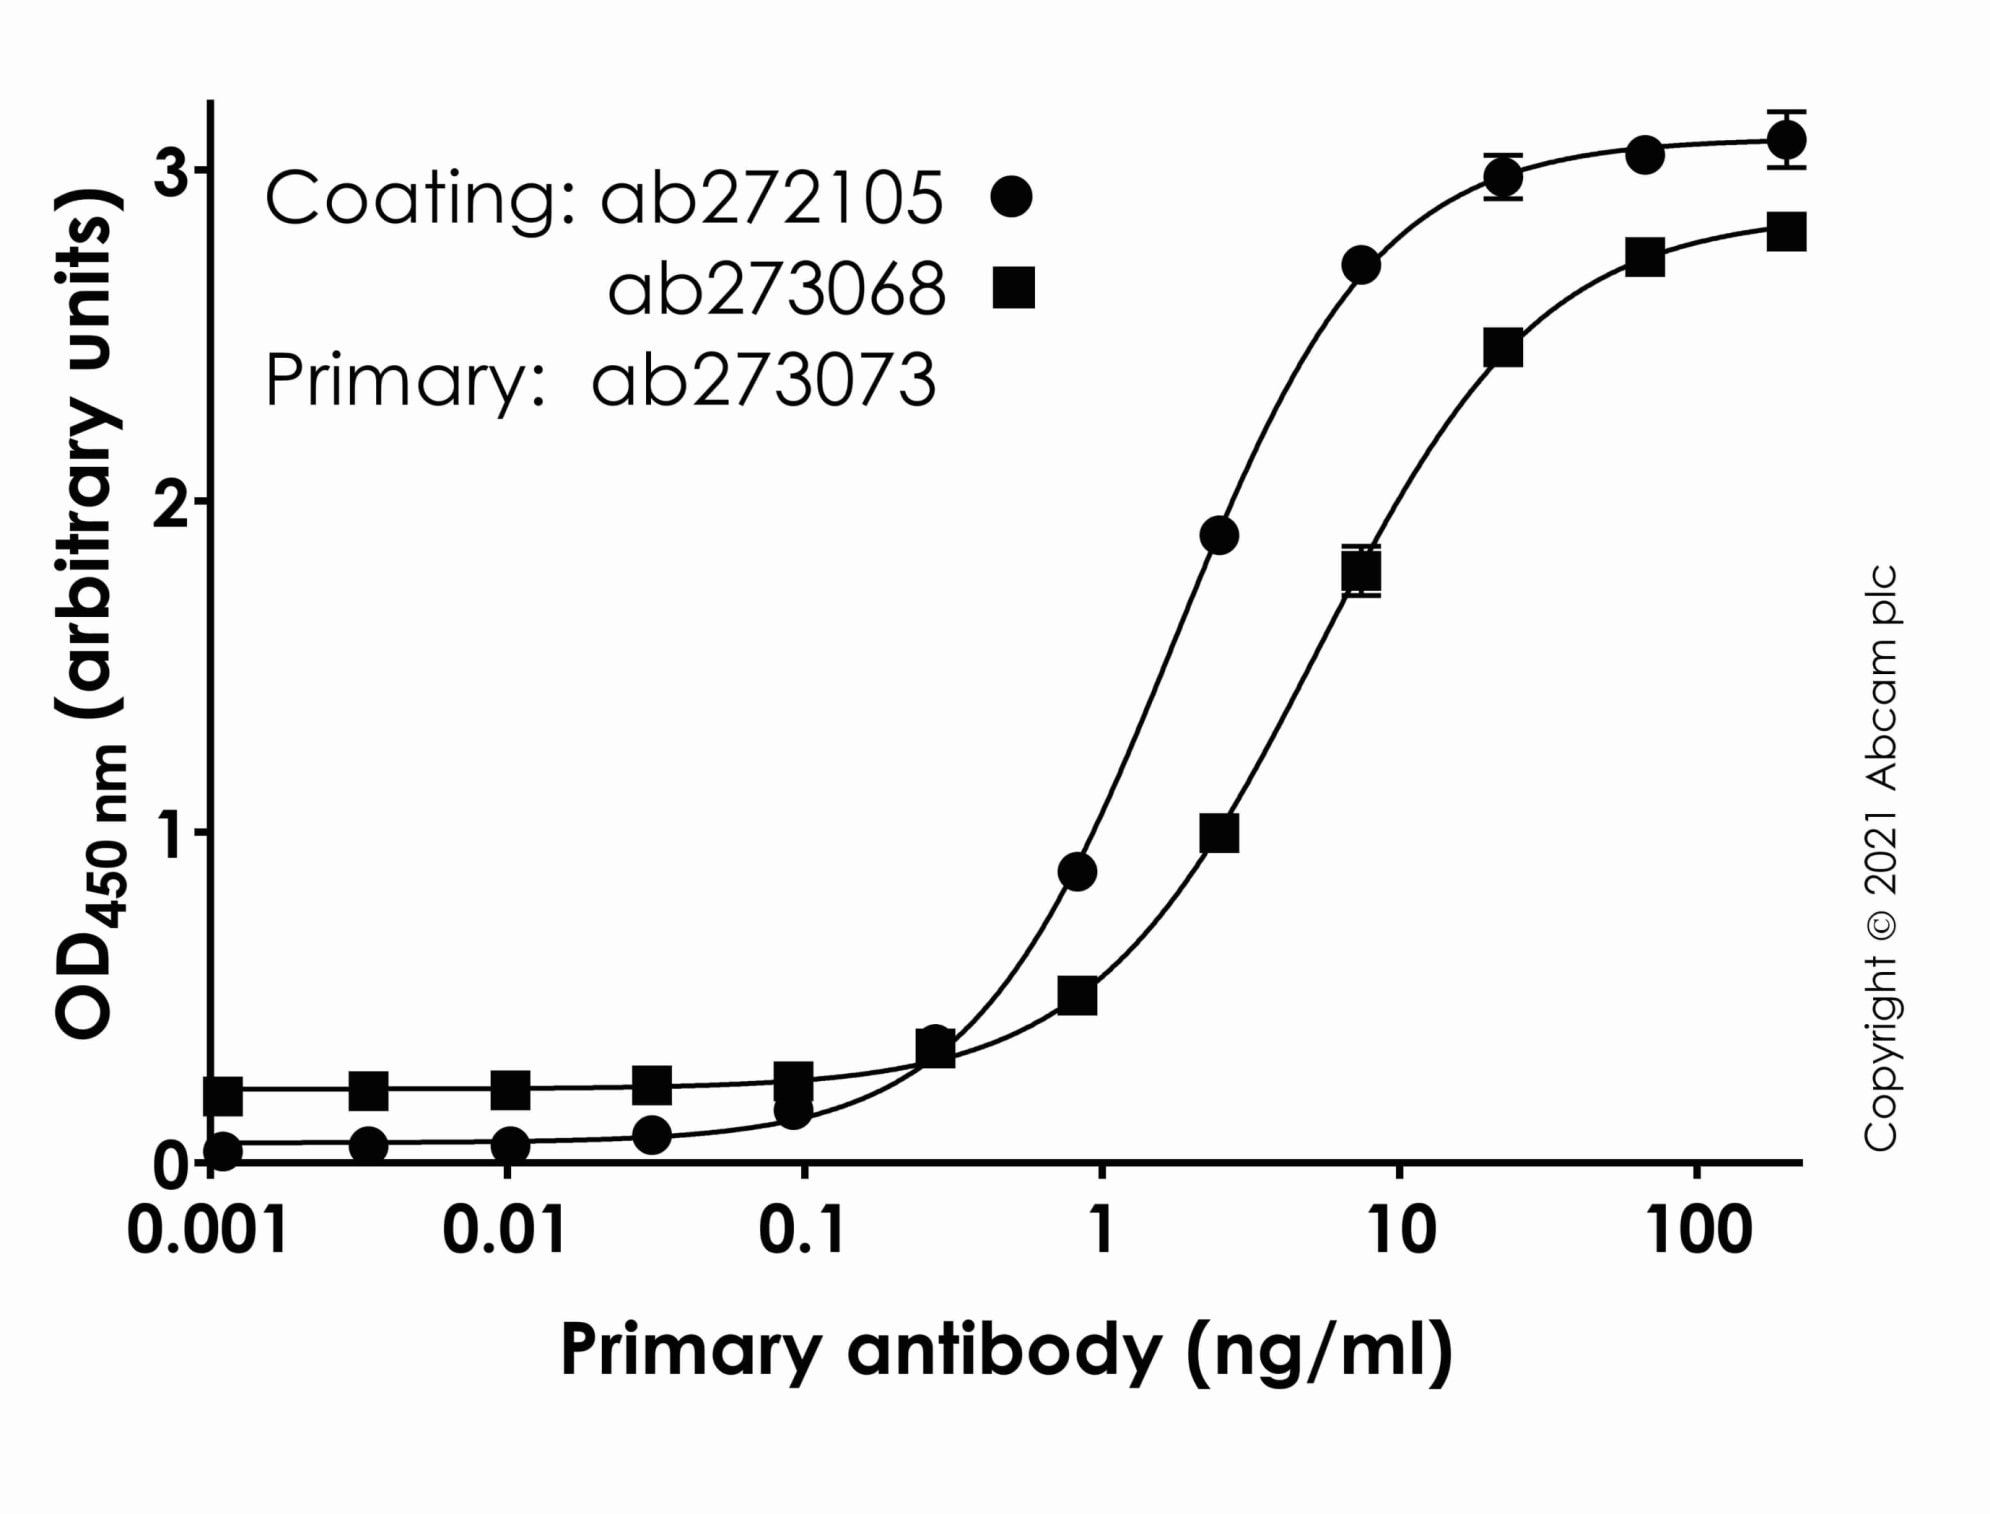 Indirect ELISA - Recombinant Human coronavirus SARS-CoV-2 Spike Glycoprotein S1 (Fc Chimera) (ab272105)